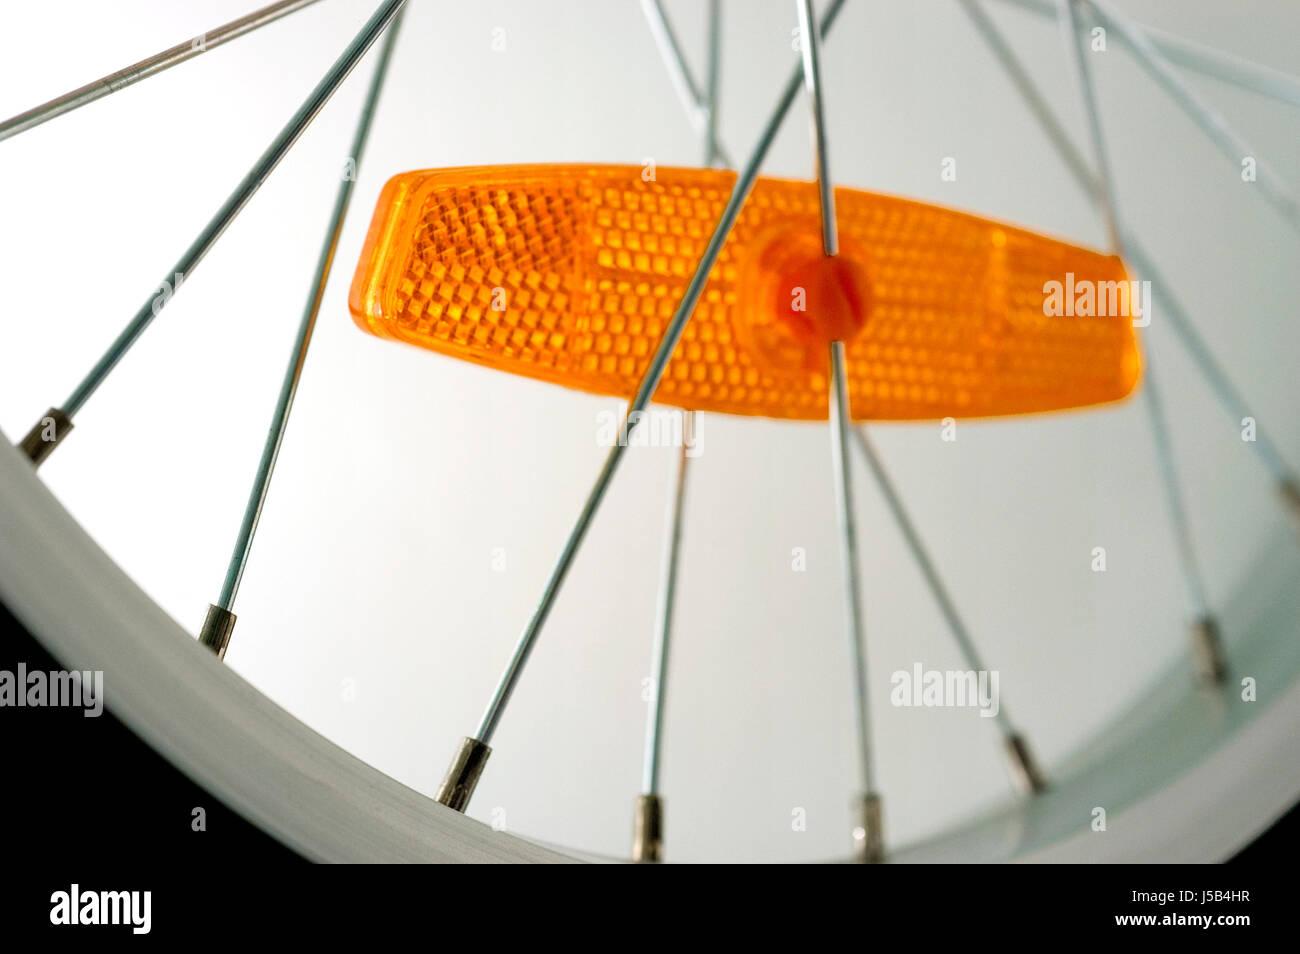 Reflektor Sprach Cat Eye Fahrrad Reifen Speichen Felgen Fahrrad